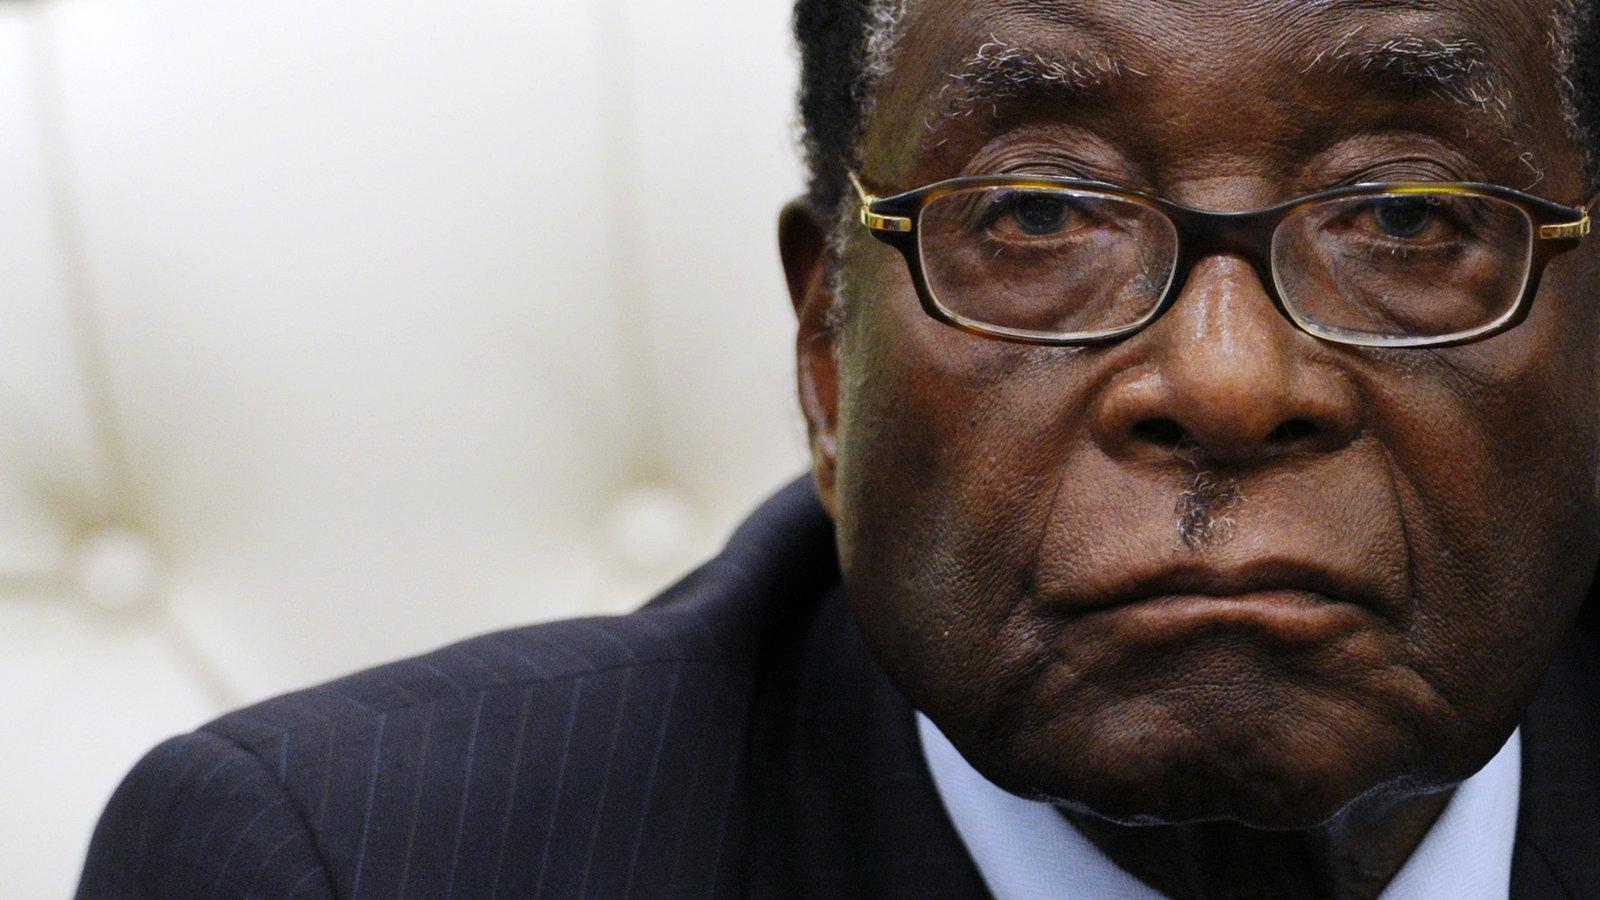 Zimbabweans bid farewell to Robert Mugabe